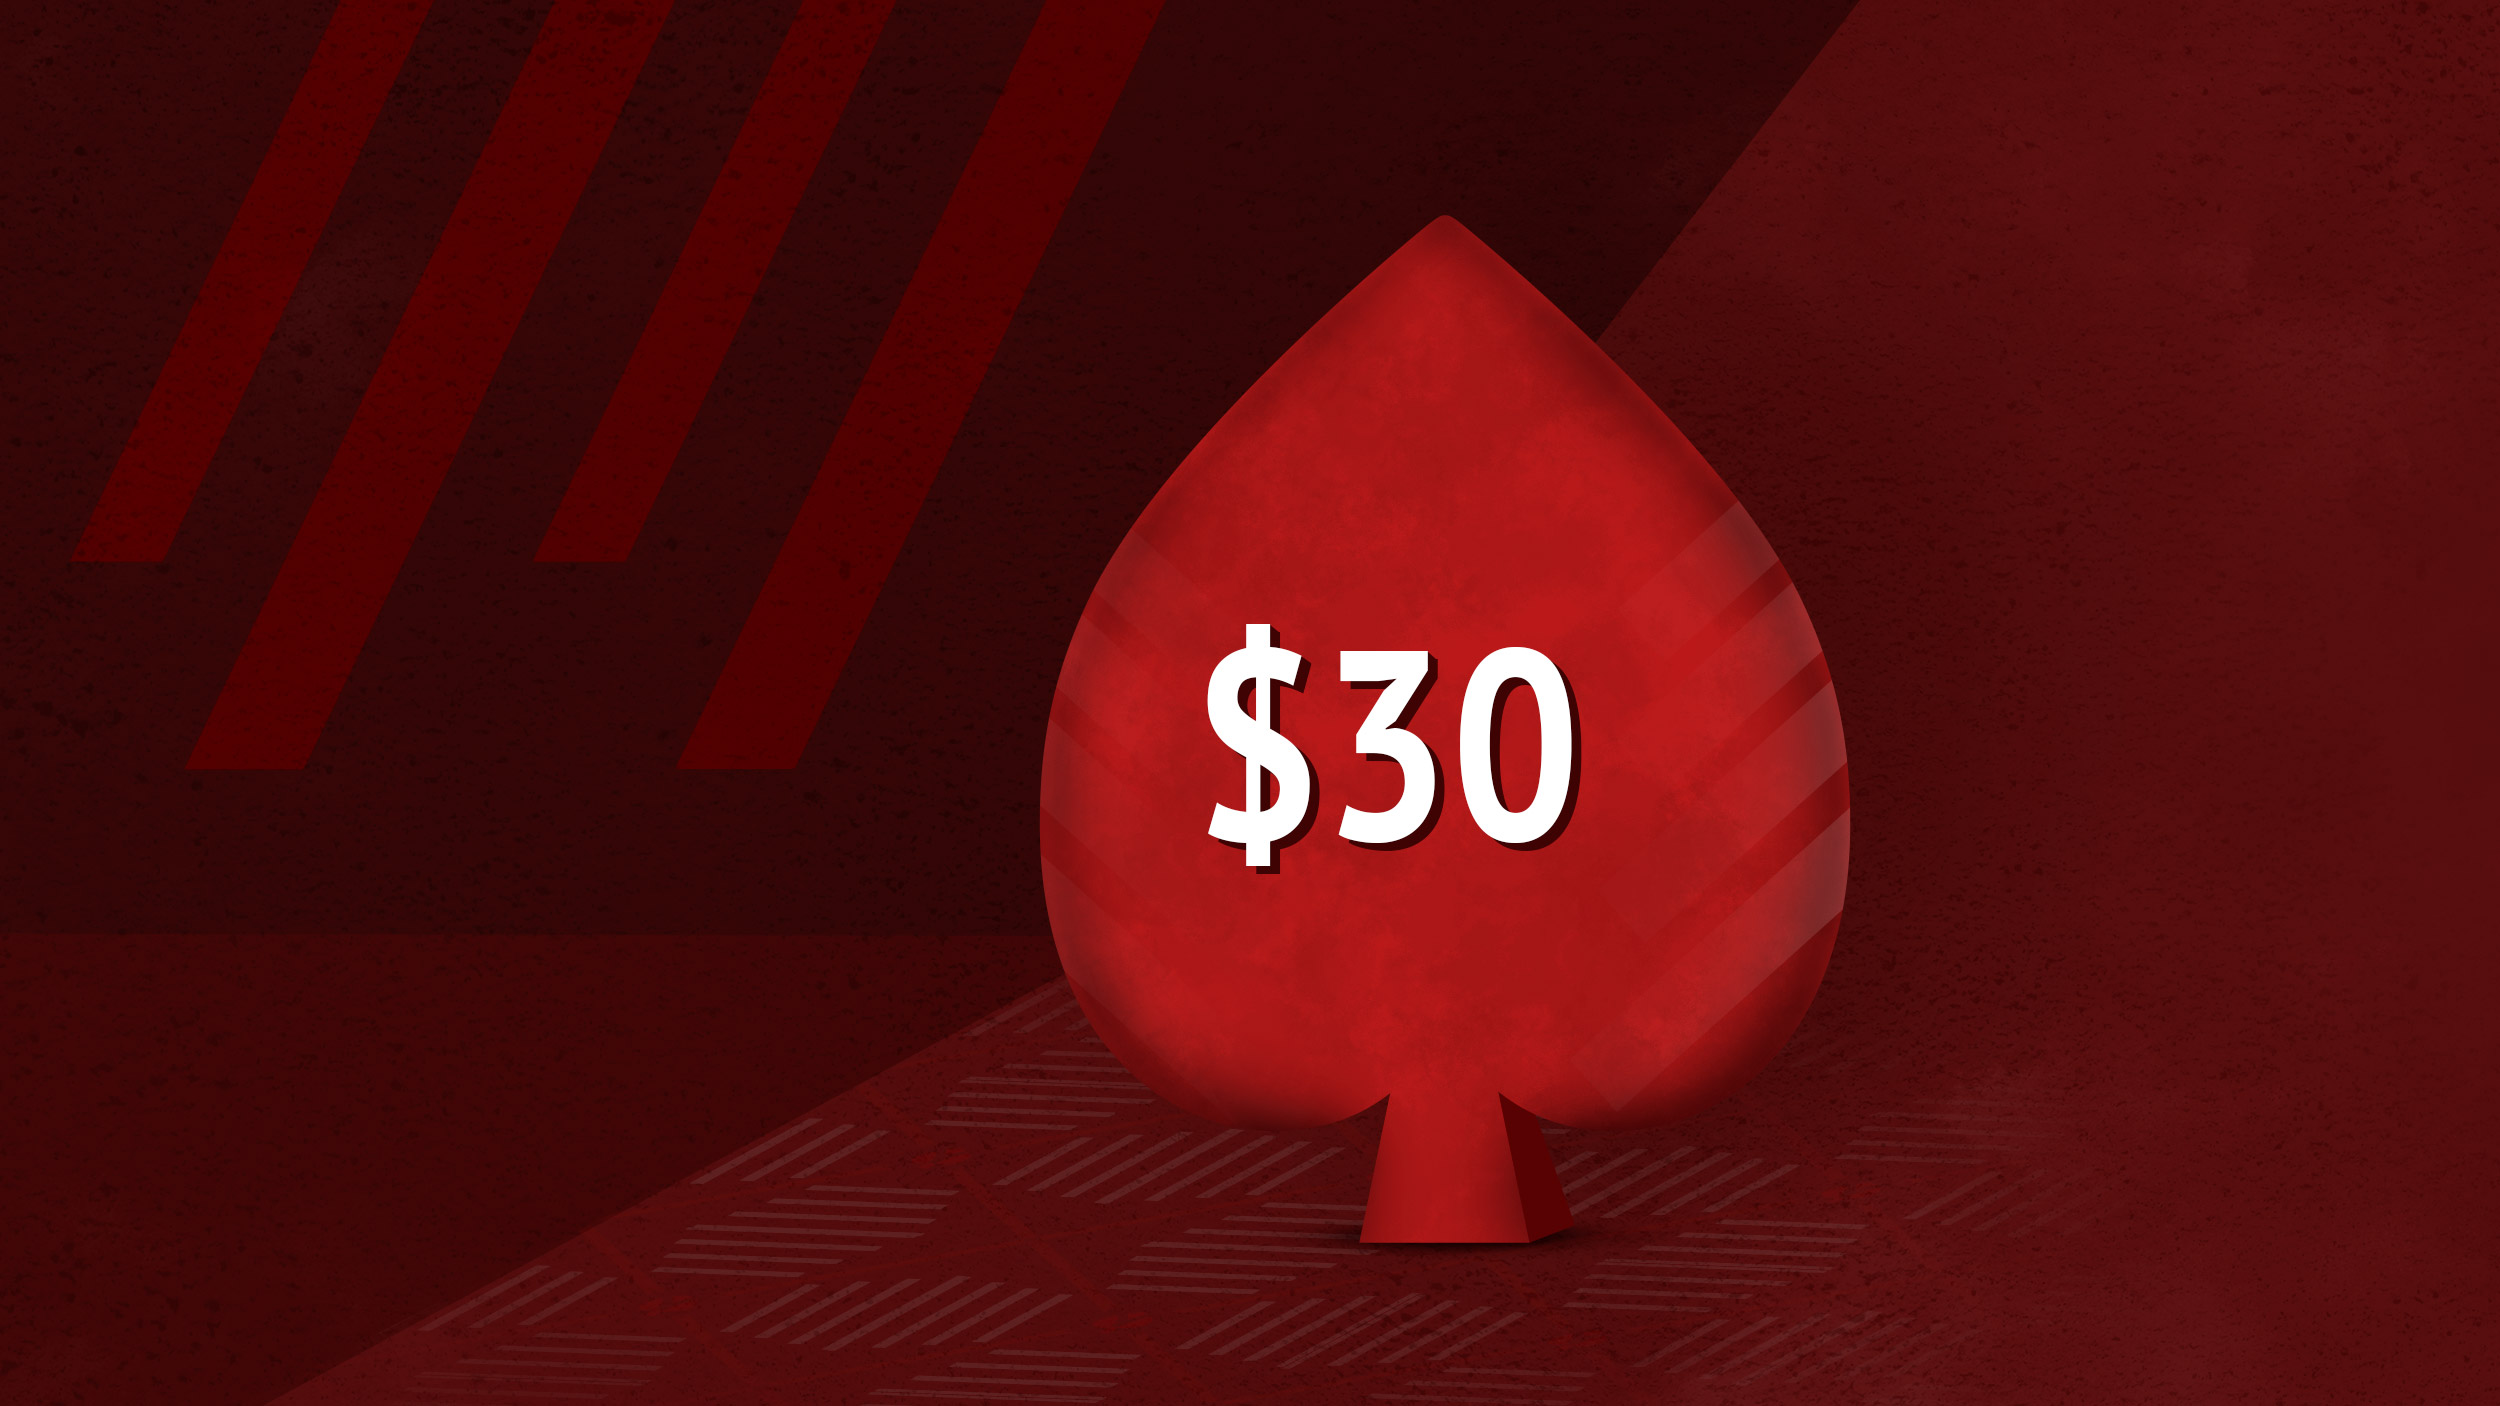 Бонус по промокоду THIRTY в руме Pokerstars.